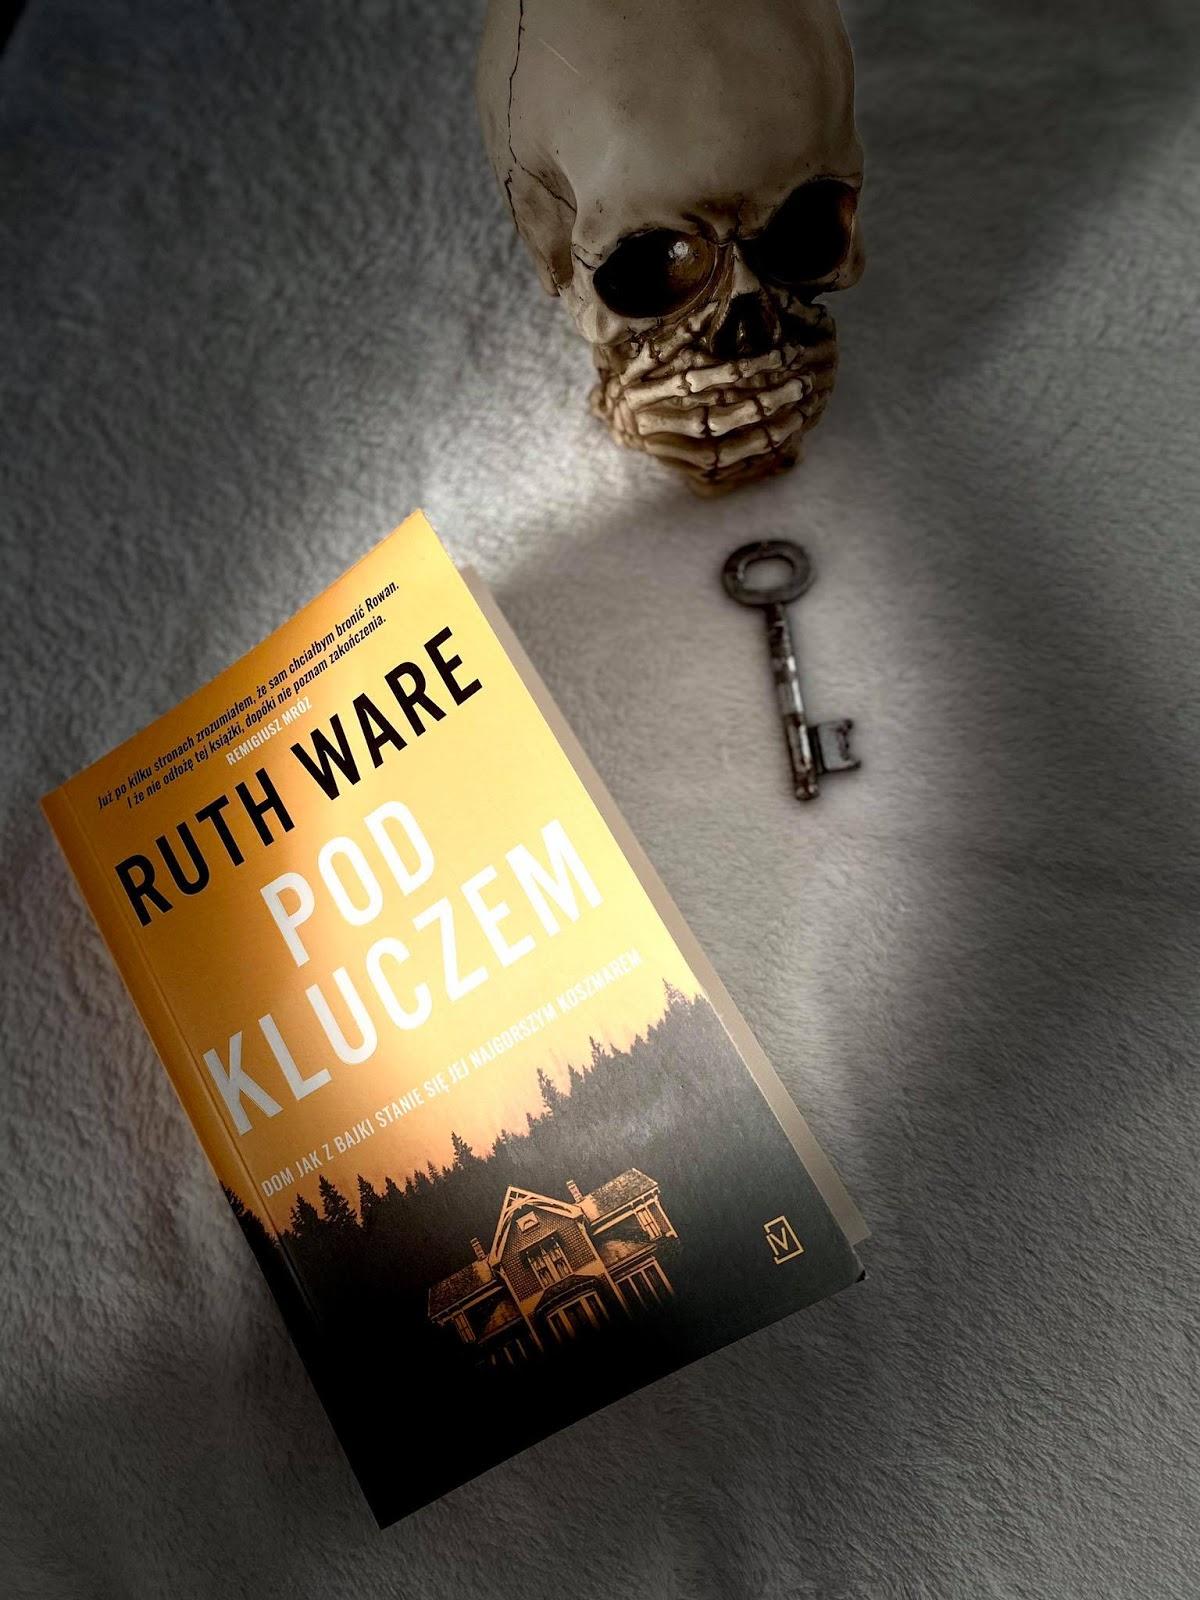 Ruth Ware - Pod kluczem